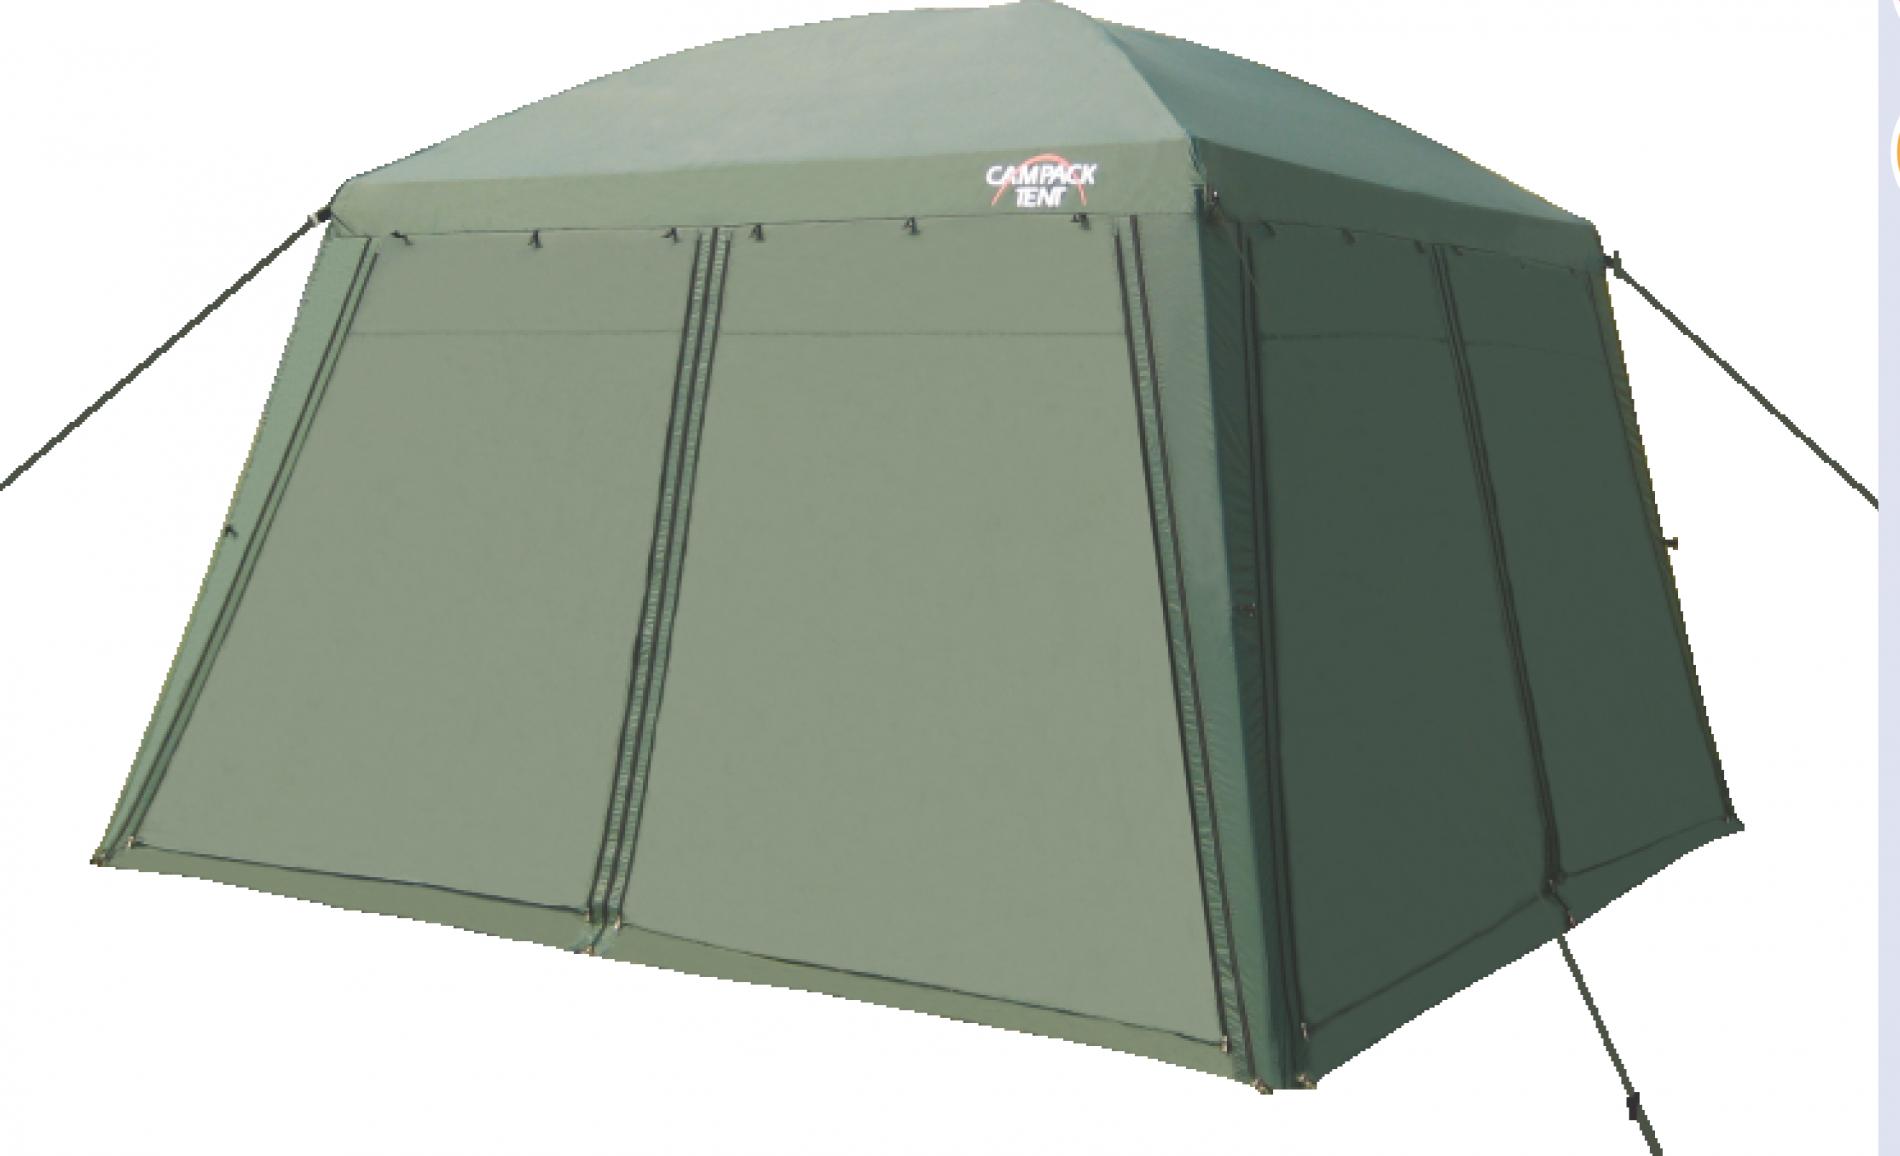 Тент CAMPACK-TENT G-3001Тенты<br>Ткань тента: 190T P. Taffeta PU 3000MM Сетка: No-See-Um <br>Mesh Стойки: Сталь 19 мм<br>